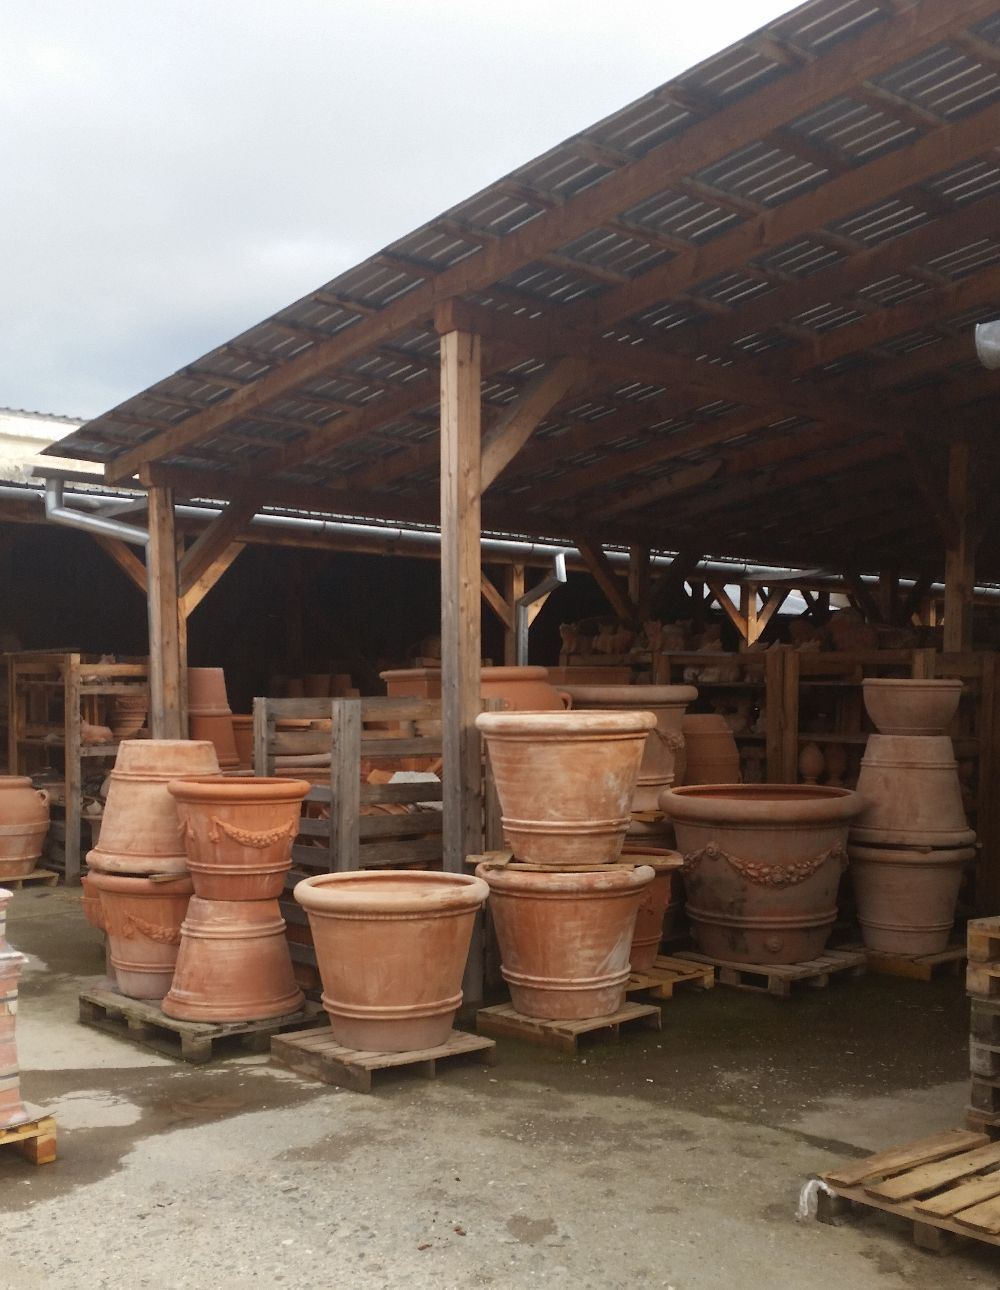 adelaparvu.com despre vase de gradina, ghivece si ornamente din teracota, lut, Terecote Sighisoara Romania (12)